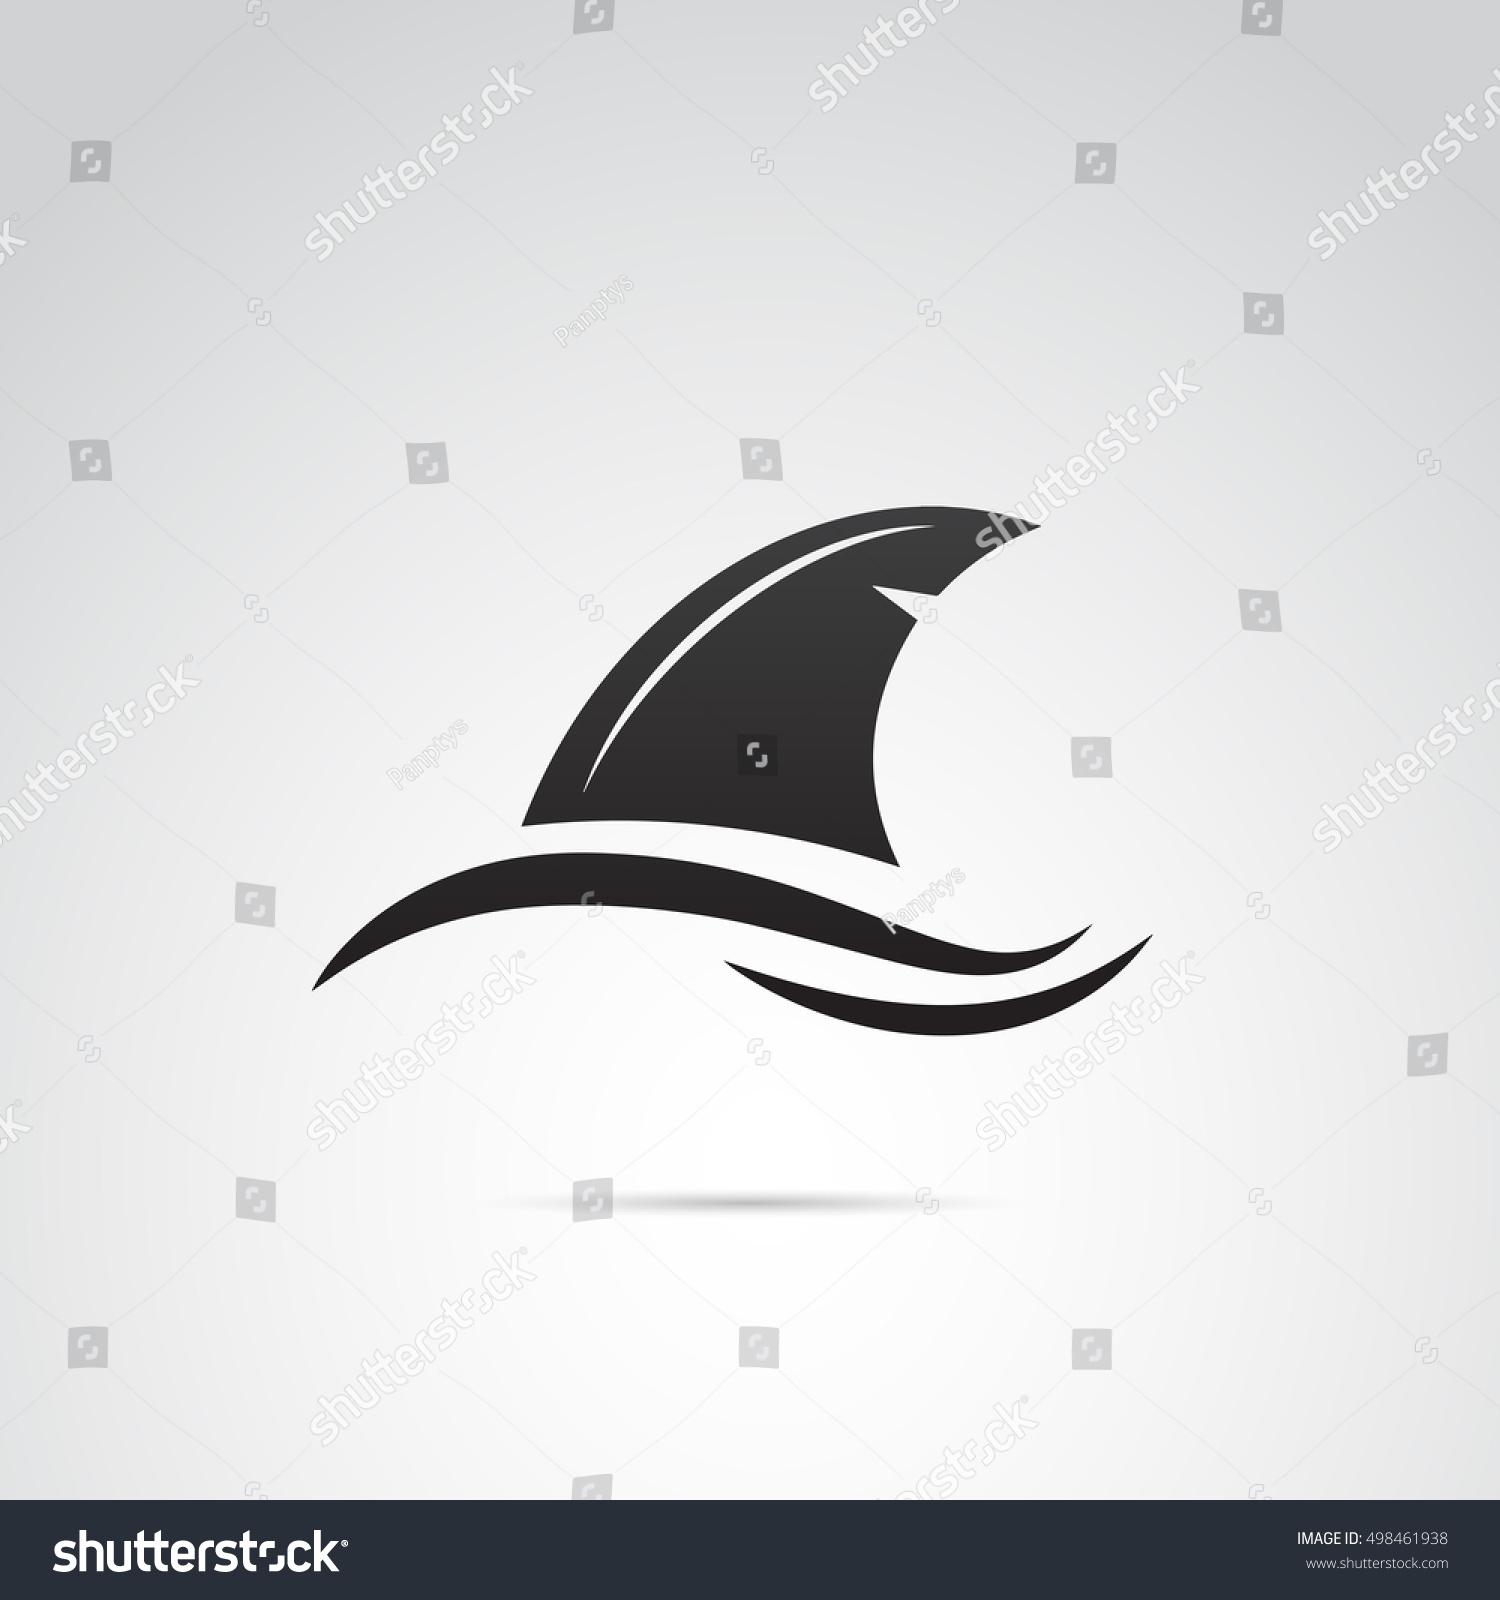 shark fin white background - photo #12